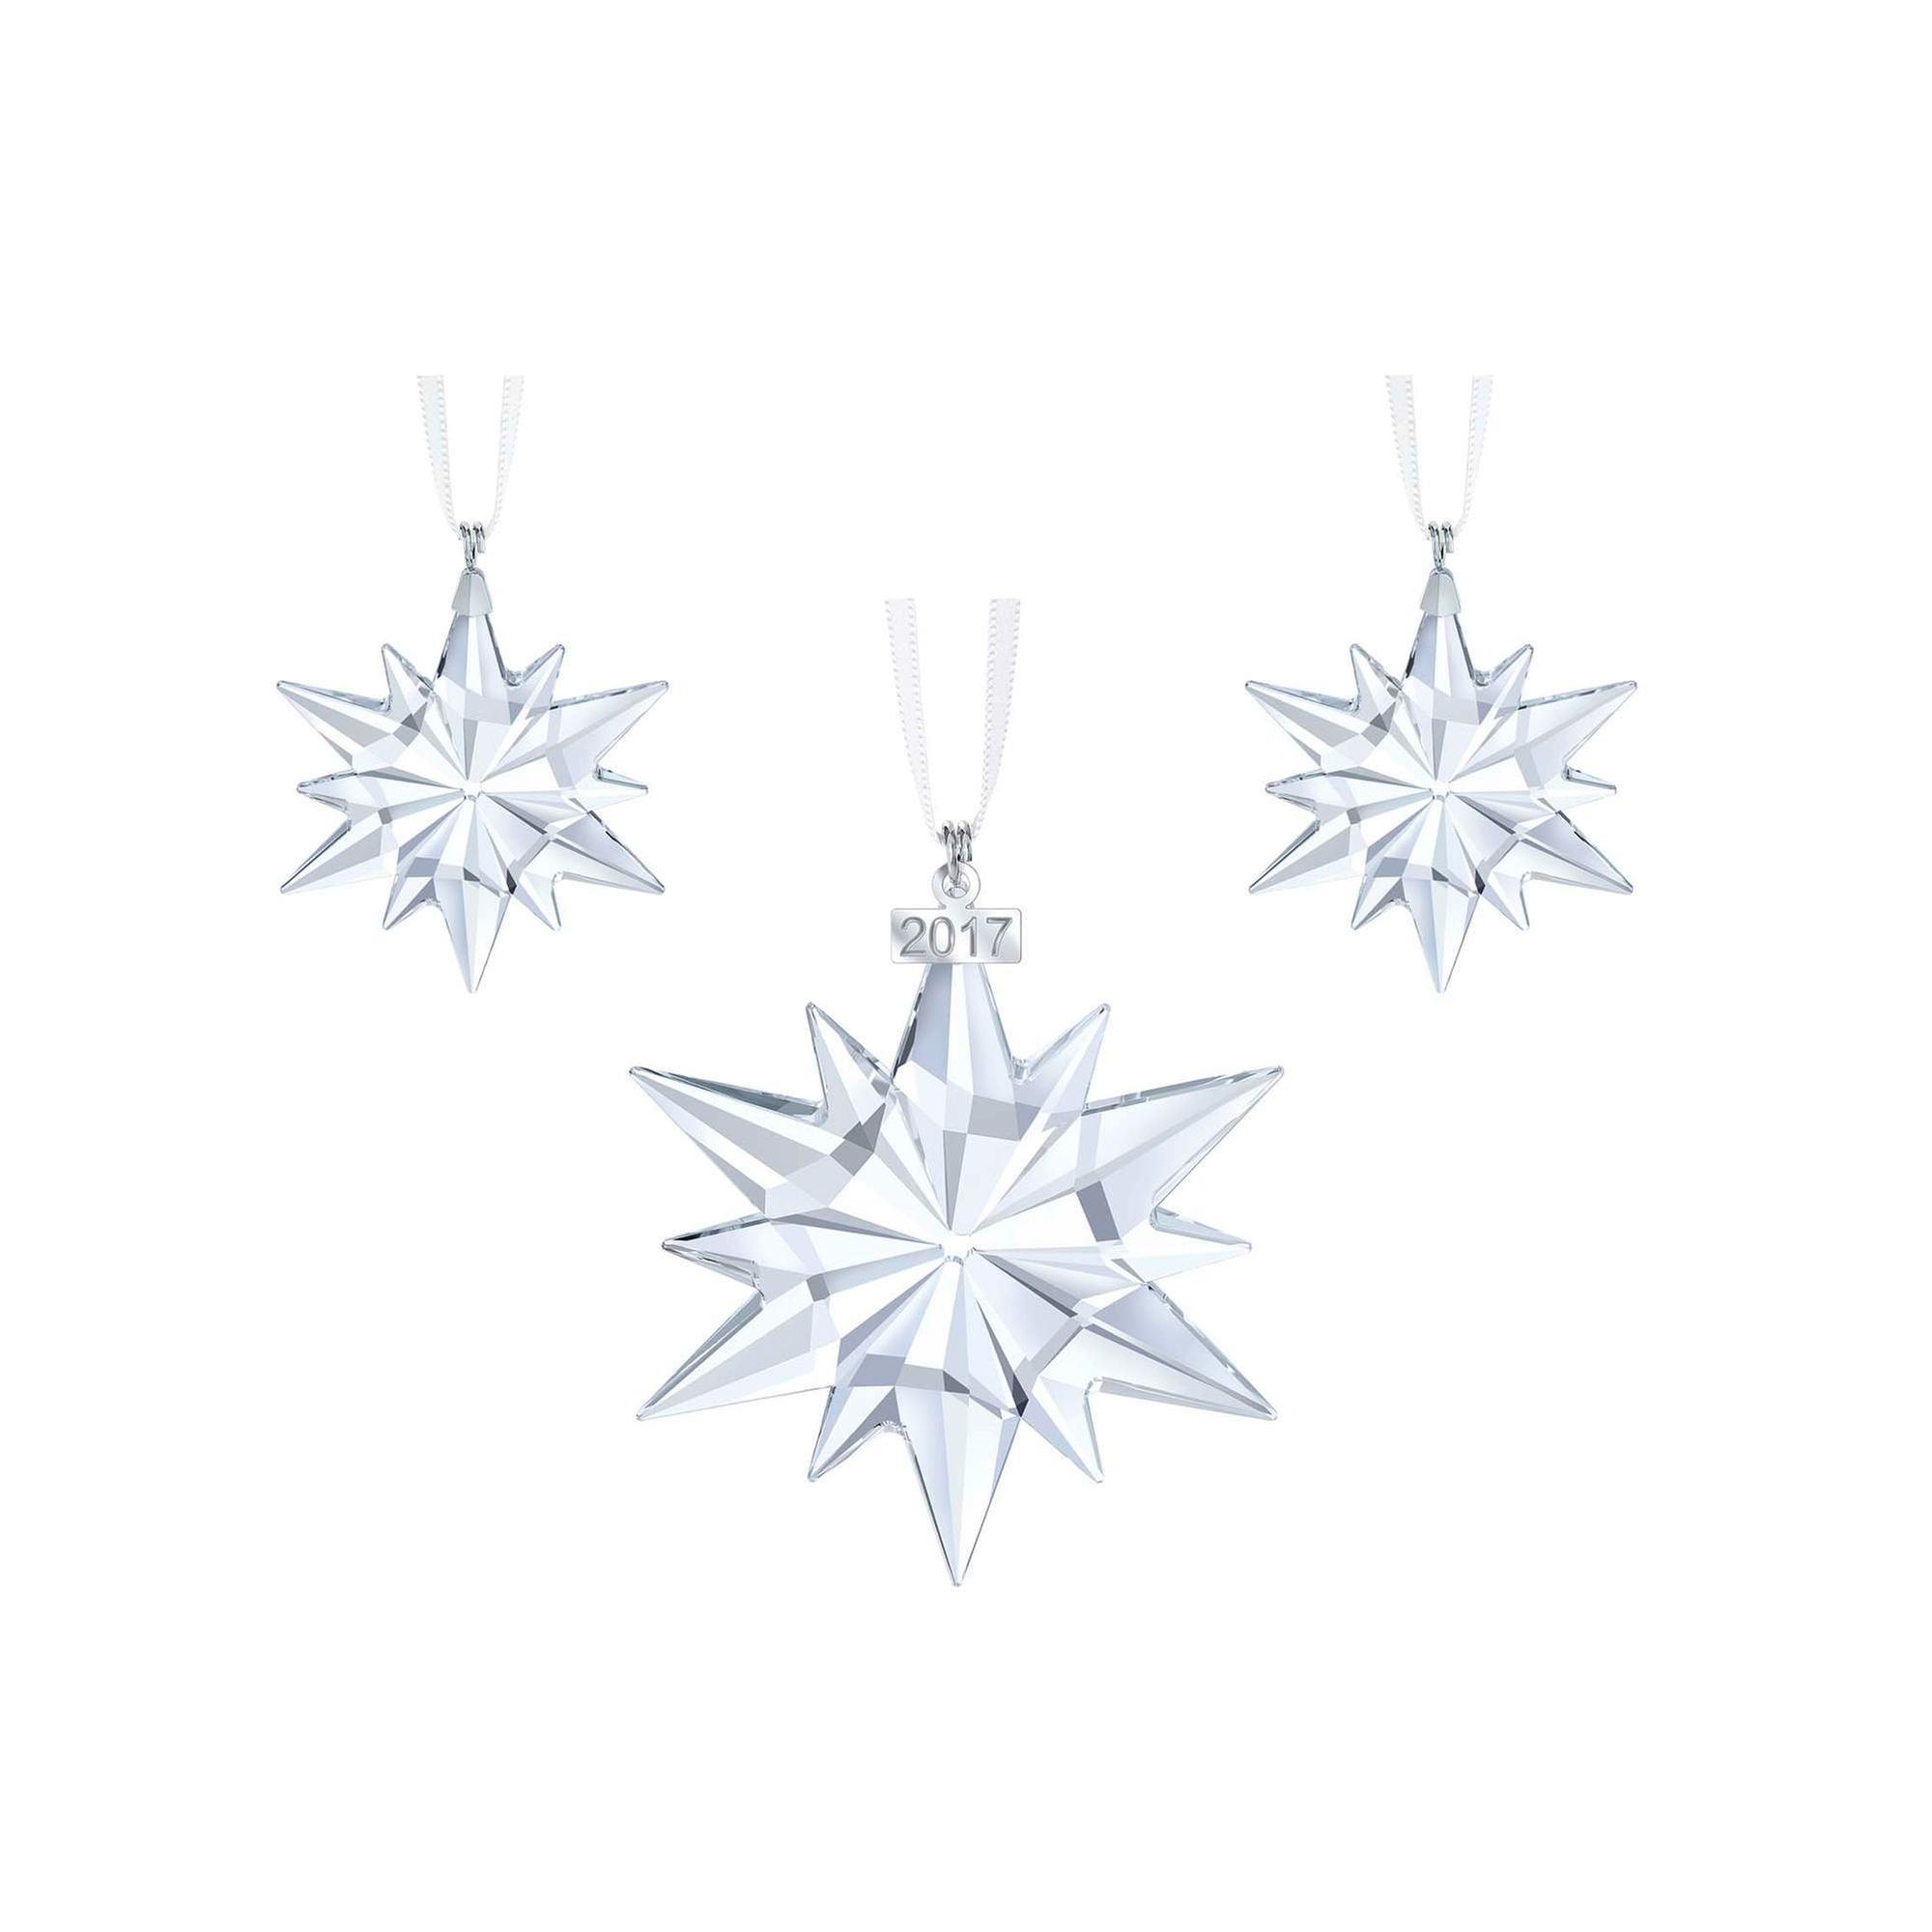 Swarovski Crystal Christmas Set 2017 by Unknown